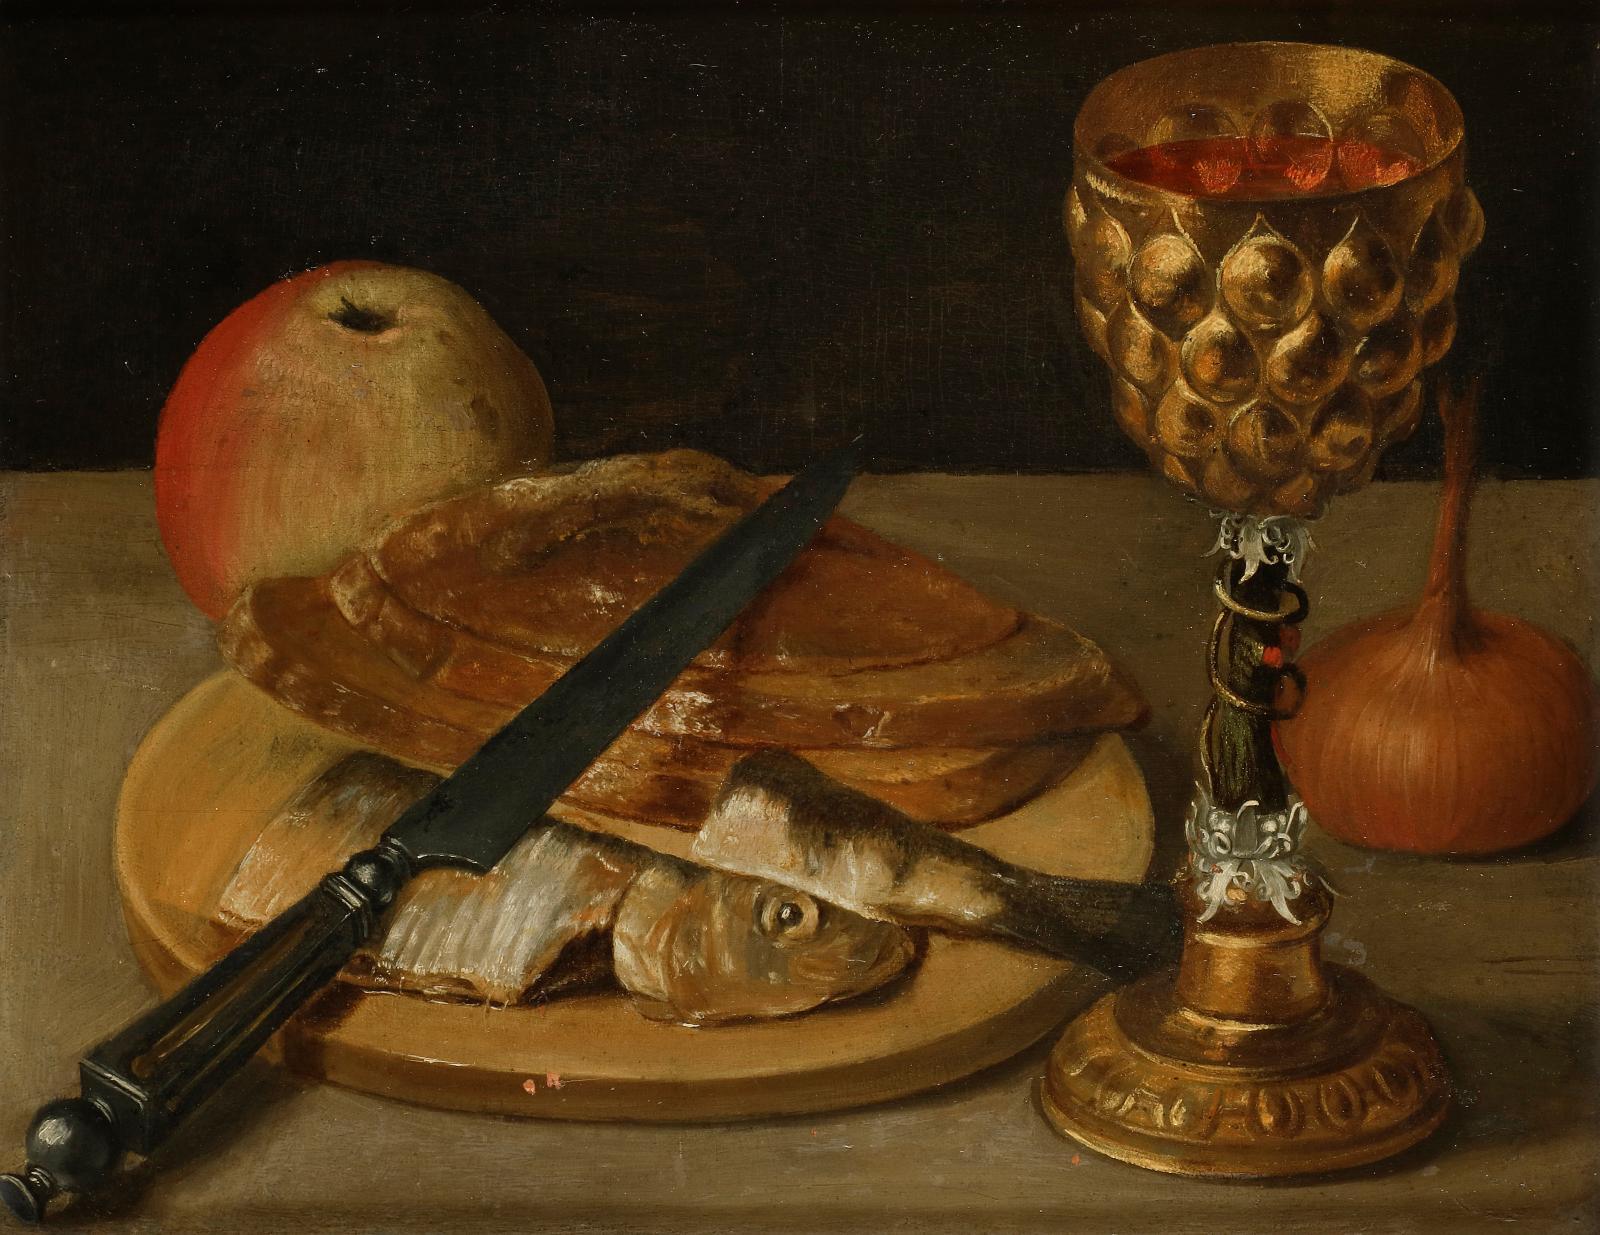 Georg Flegel (1566-1638), Nature morte au hareng et pokal, oil on panel, 21.6 x 27.5 cm.Estimate: €30,000/40,000